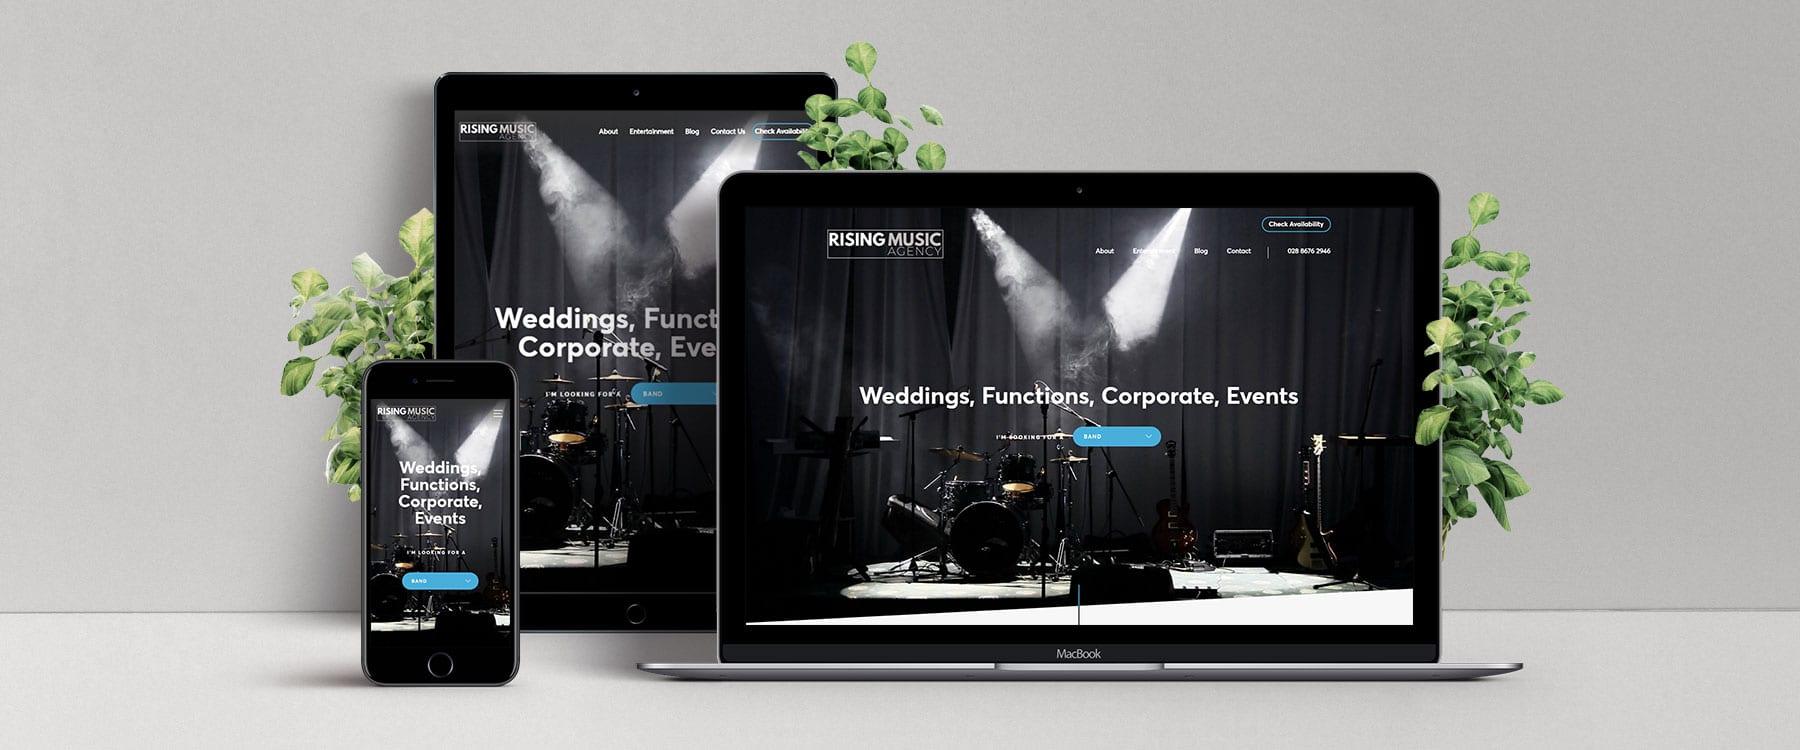 Brand New Website for Rising Music Agency Image